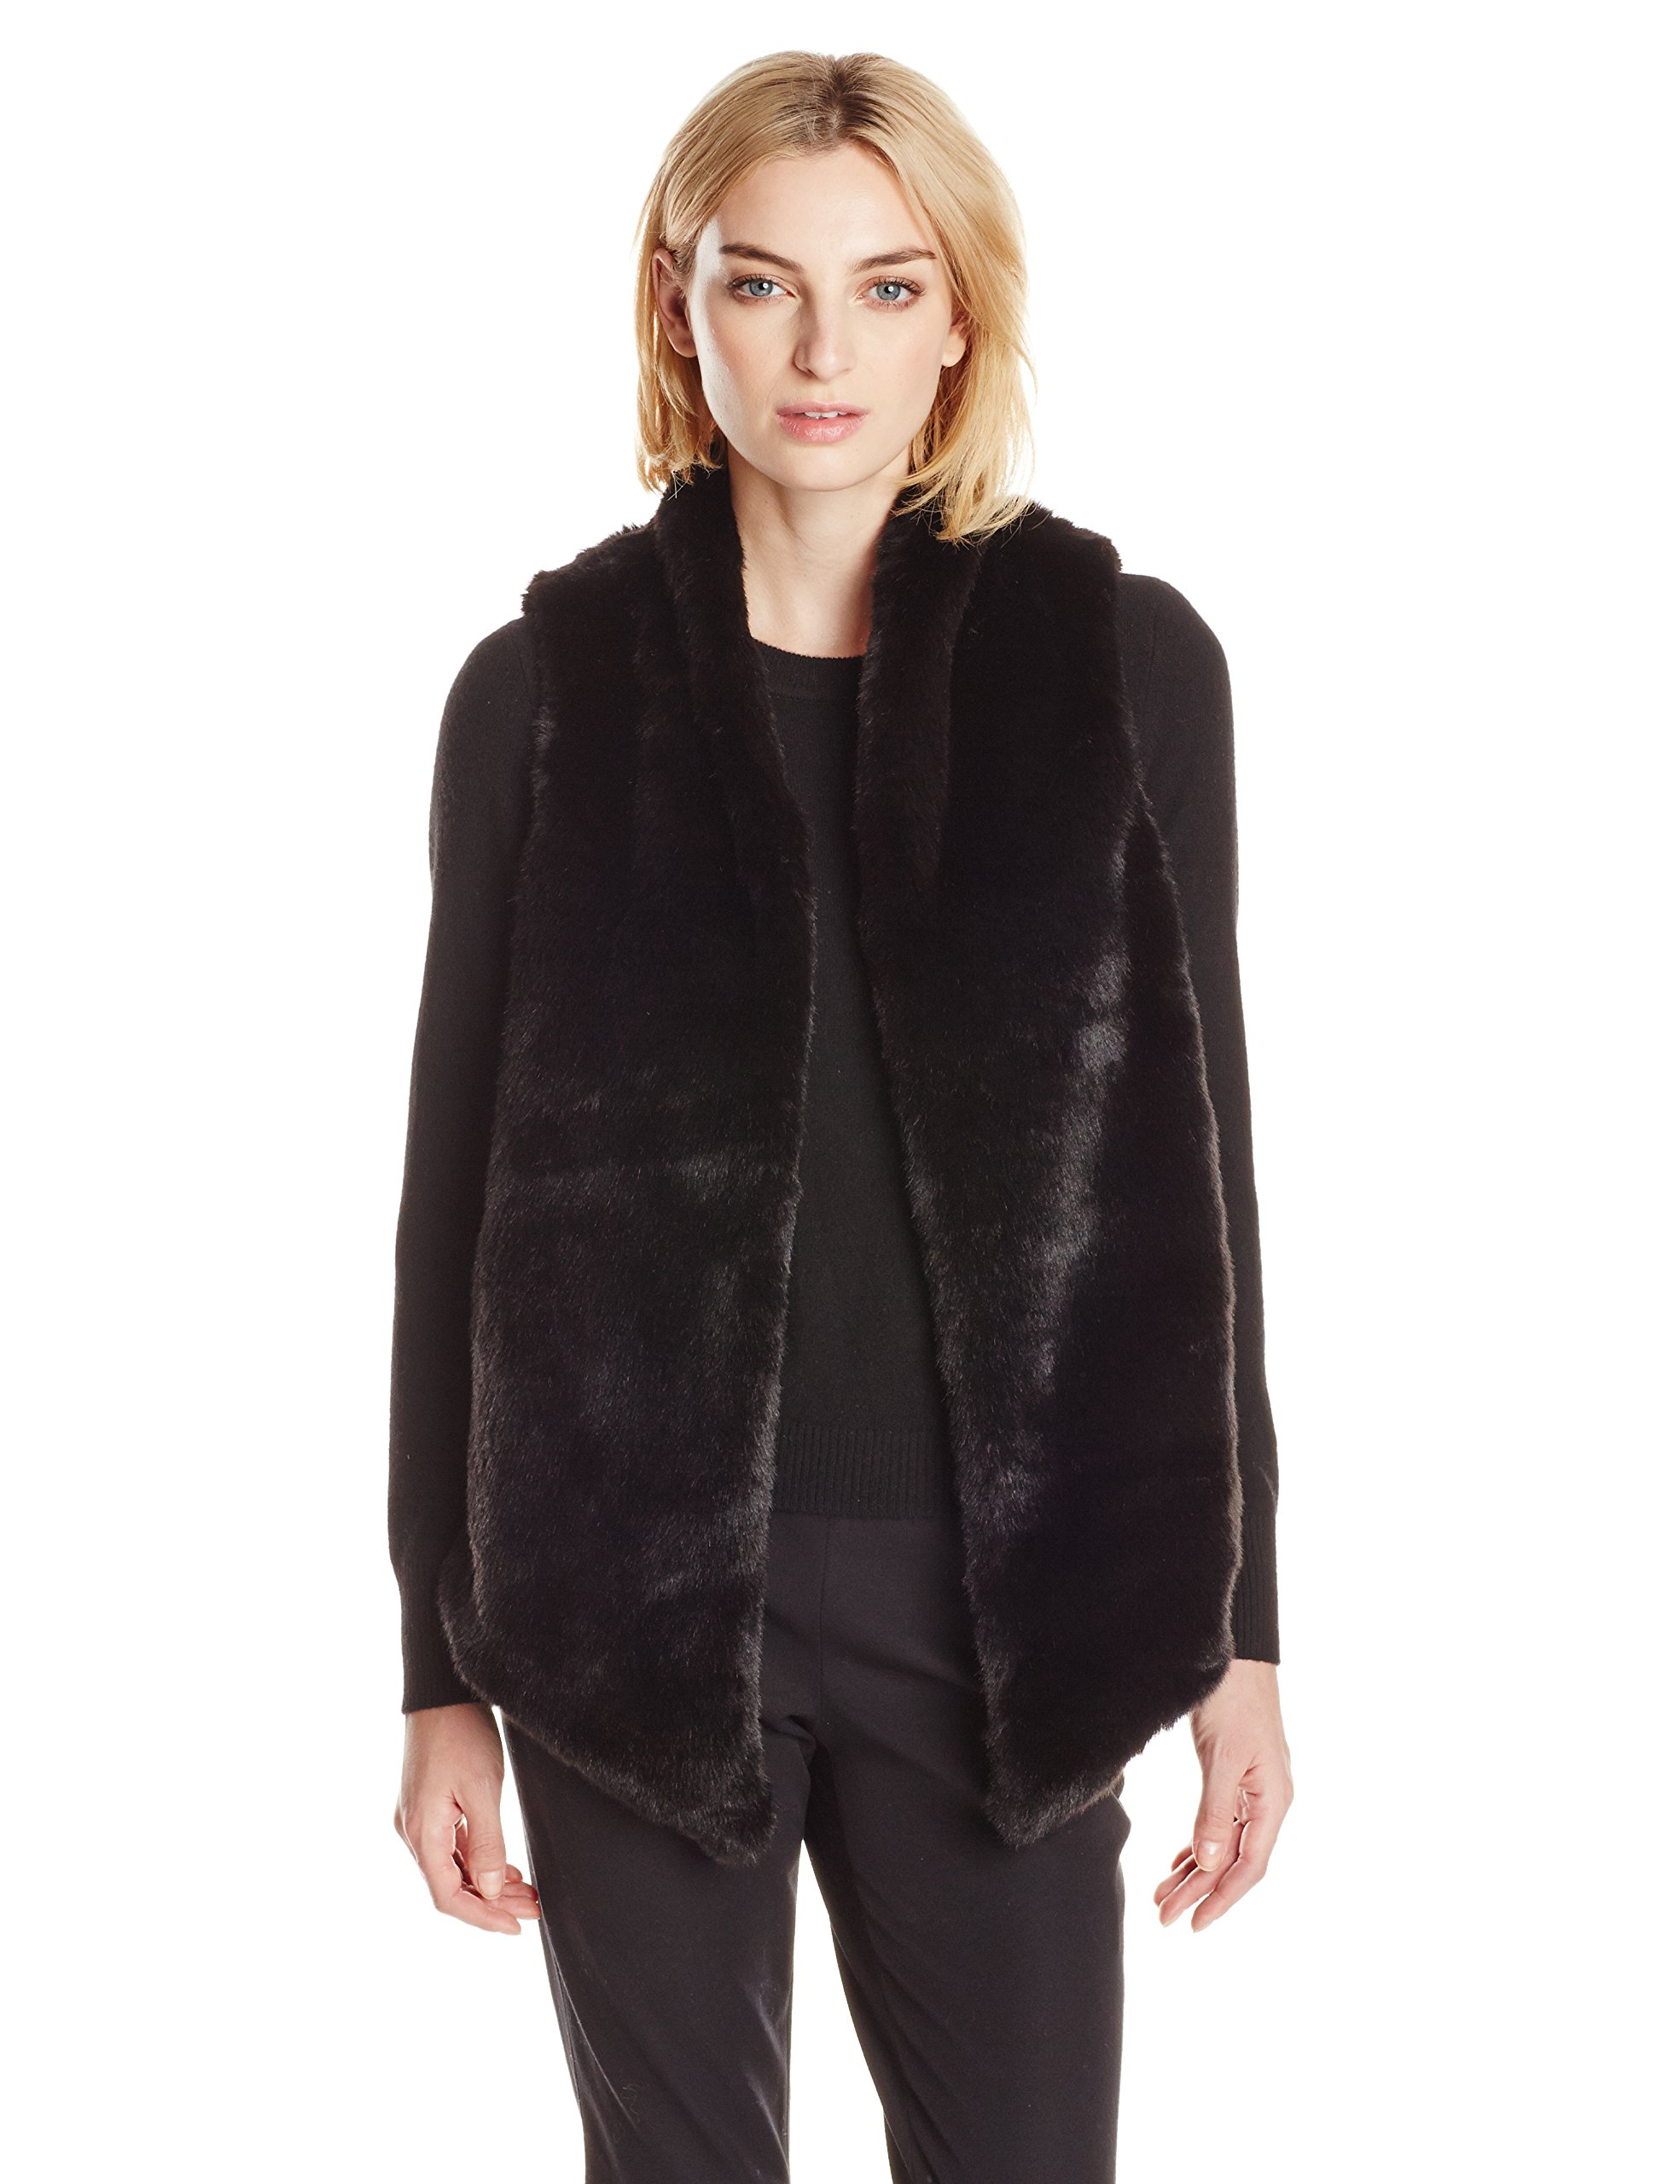 Tart Collections Women's Kya Faux Fur Vest, Black, Medium